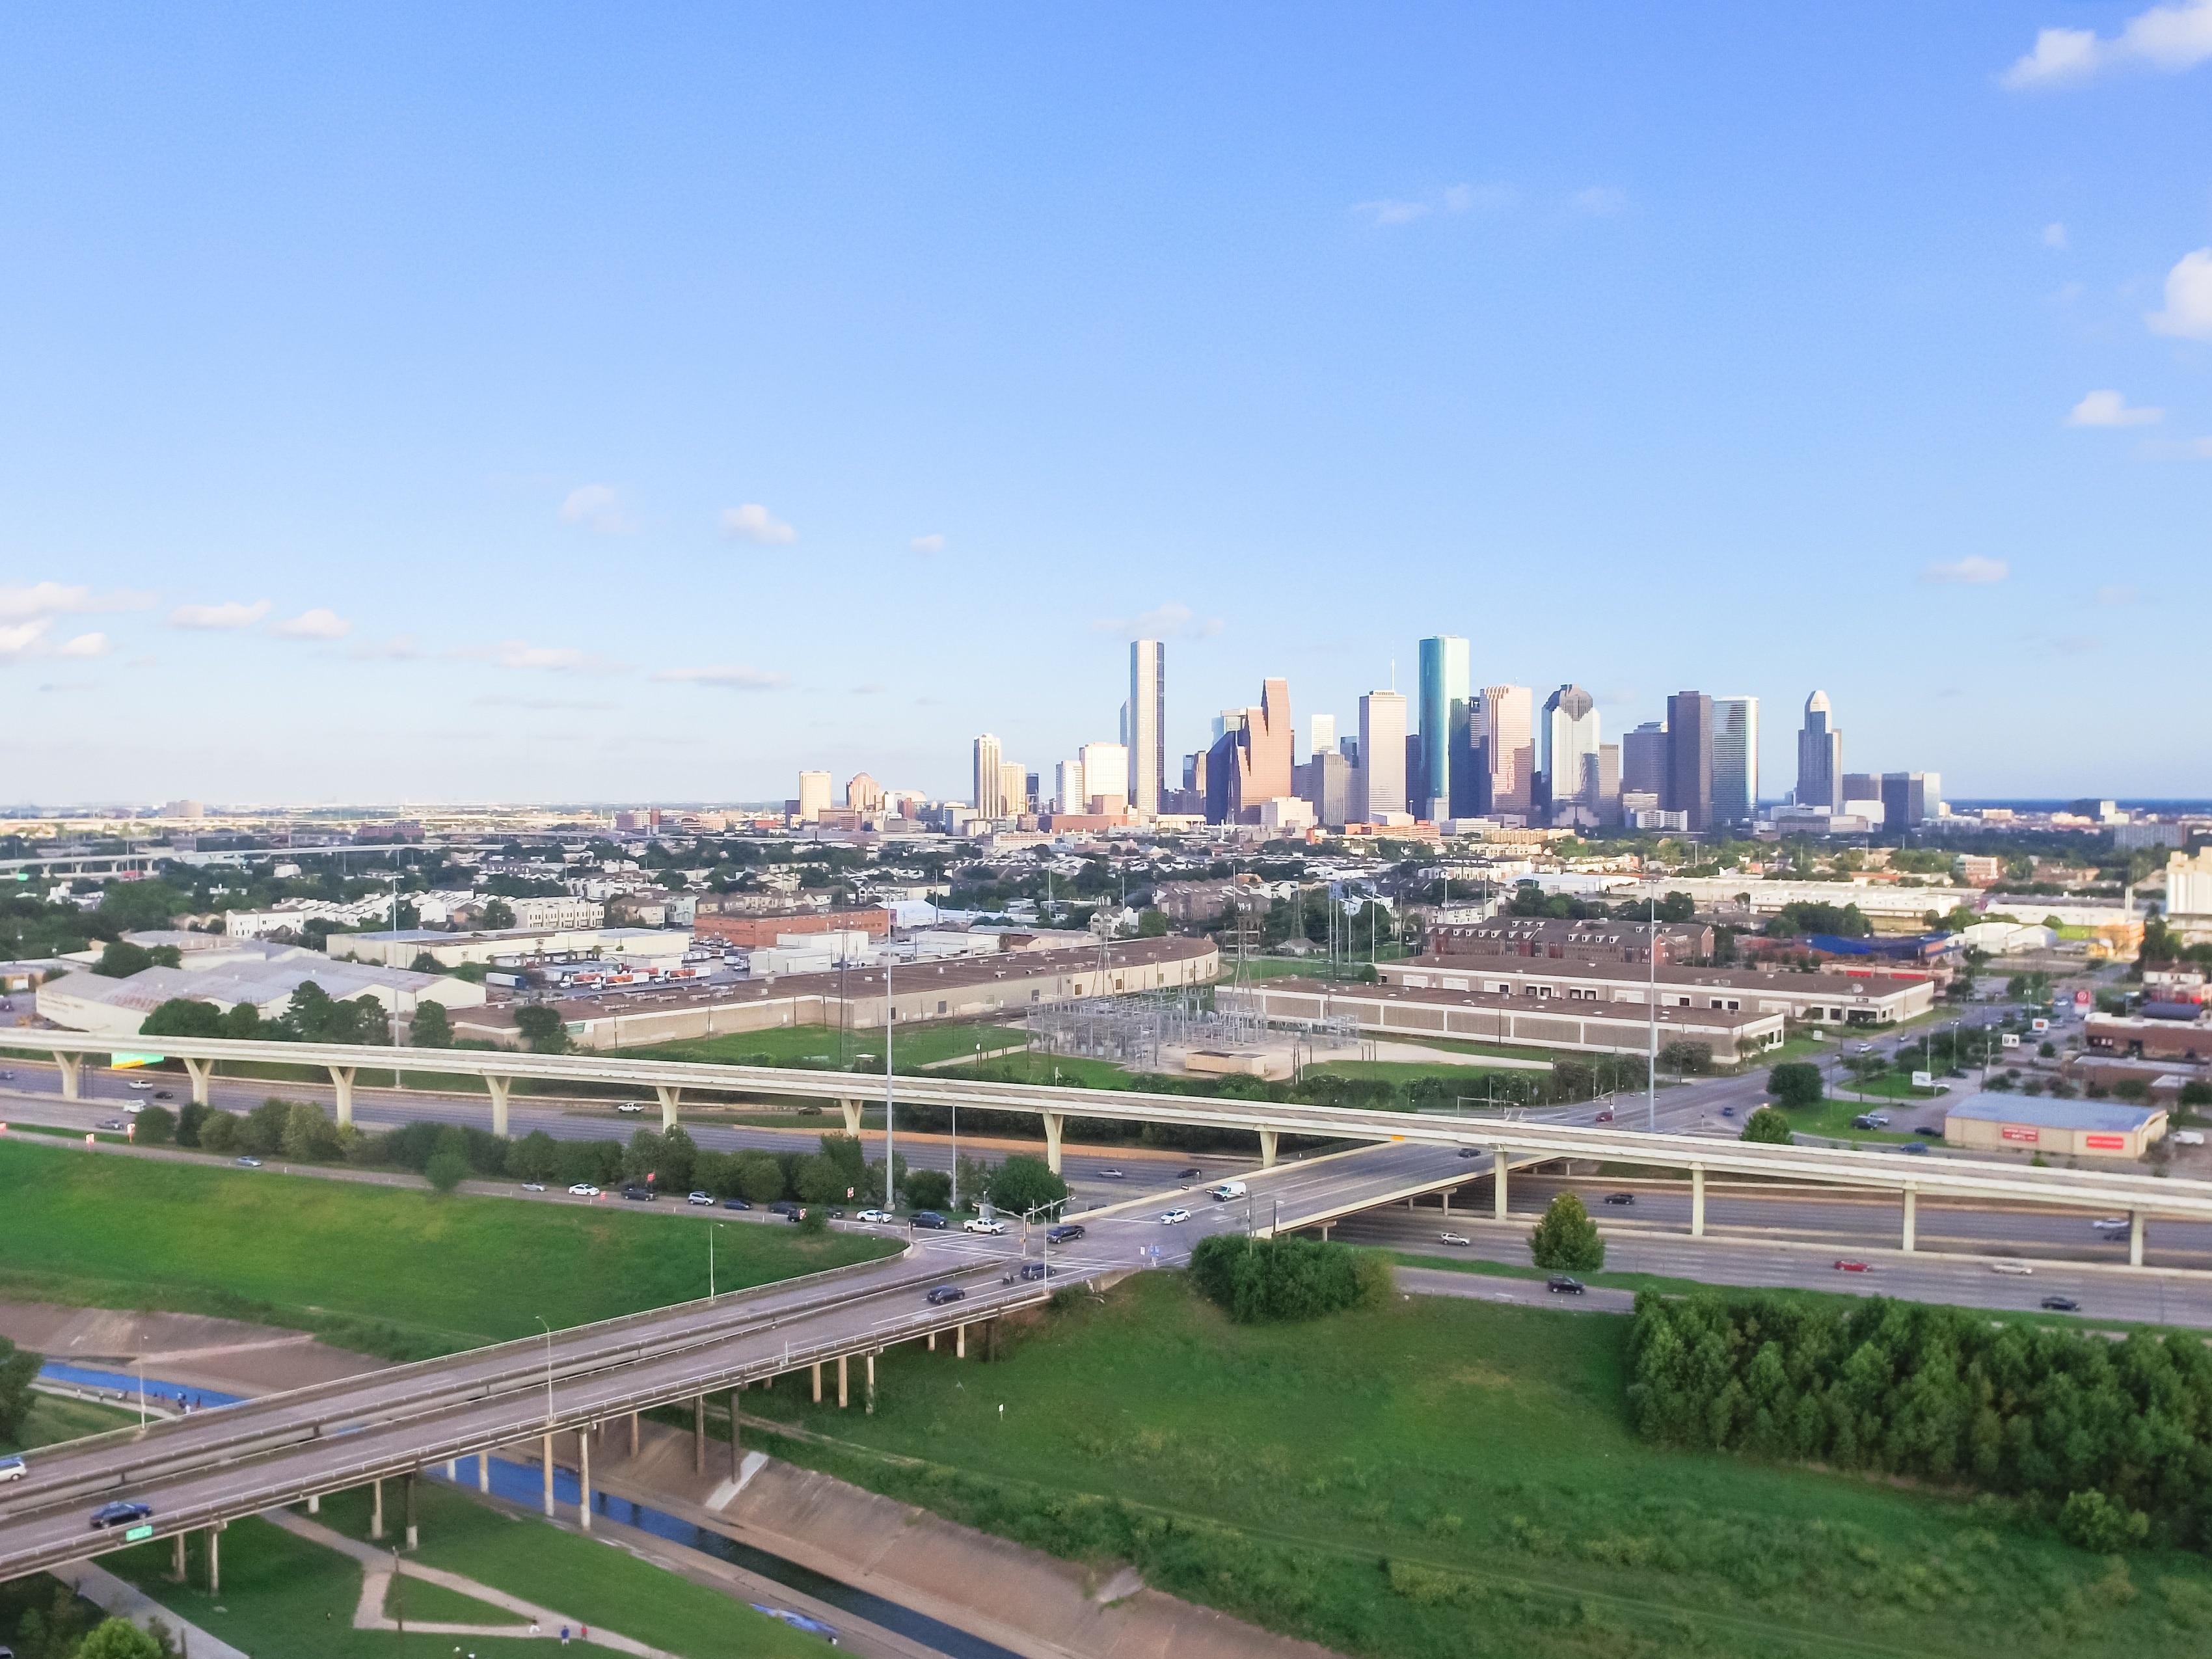 Katy, Texas, United States of America